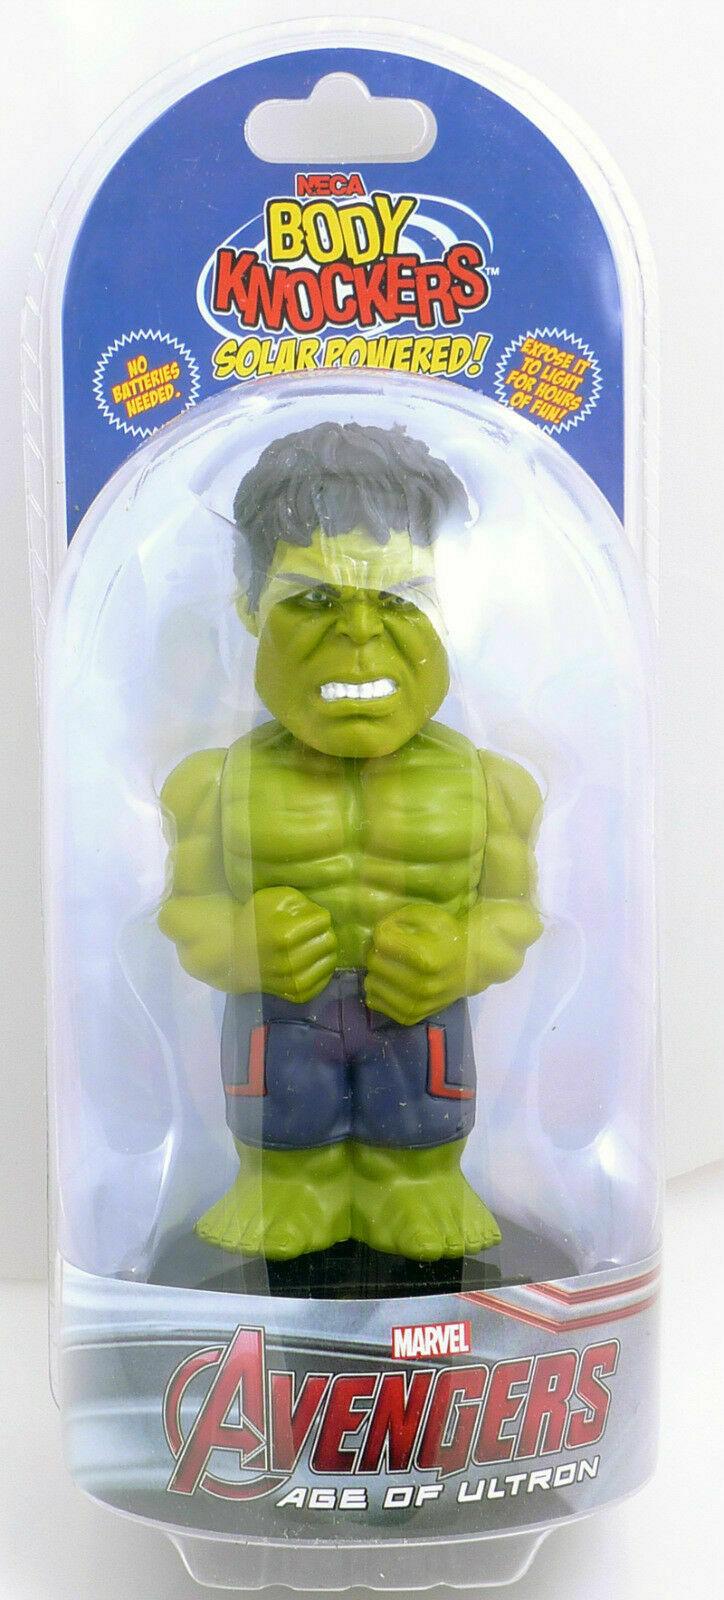 The Avengers Age Of Ultron 2 Green Hulk 12 inches PVC Statue Figure Figurine NIB